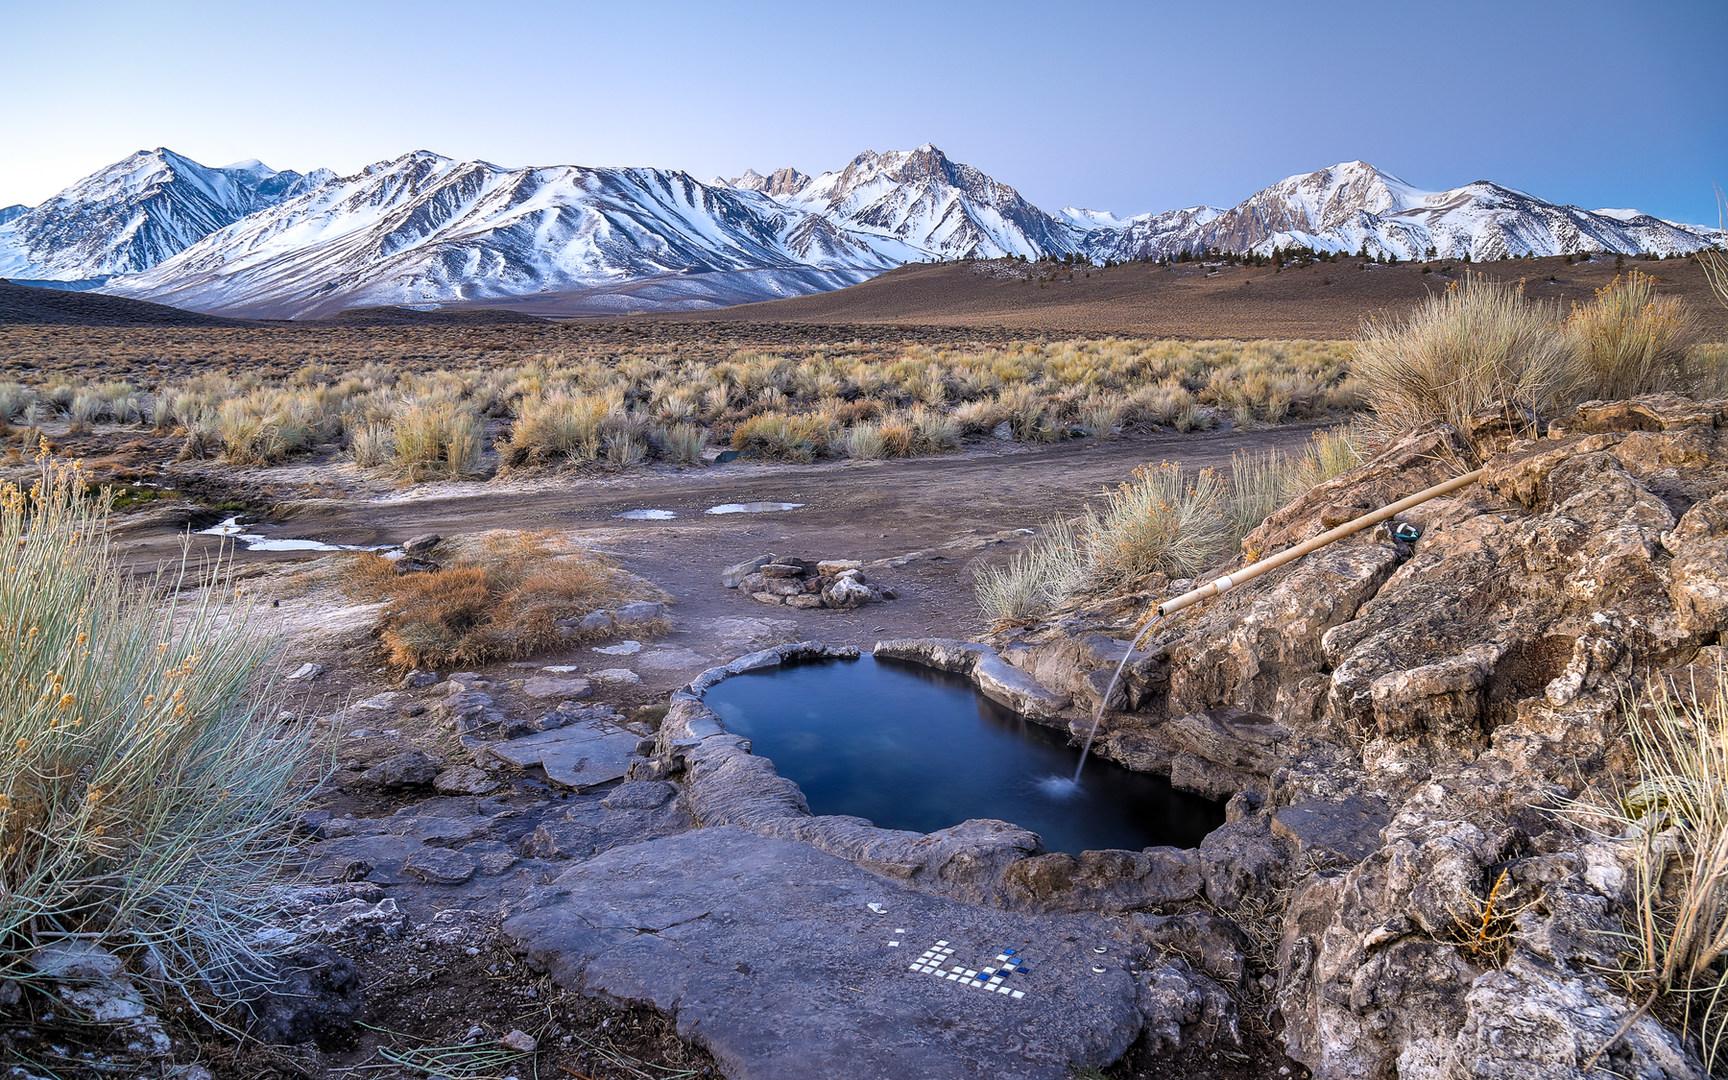 5 Best Free Hot Springs in Mammoth Lakes, California